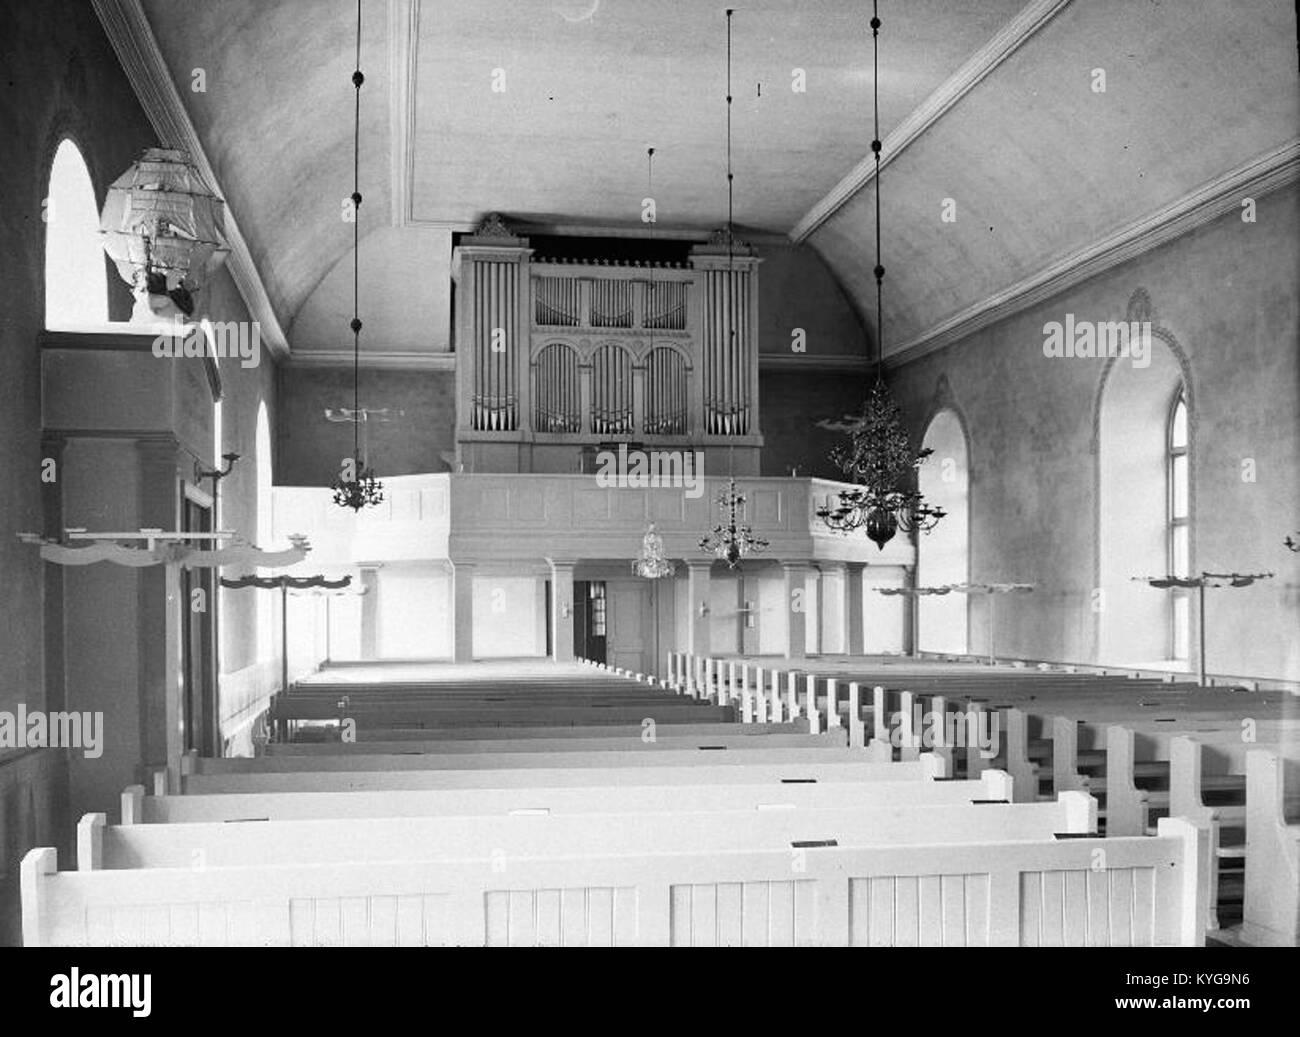 Rådmansö kyrka - KMB - 16000200127813 Stock Photo